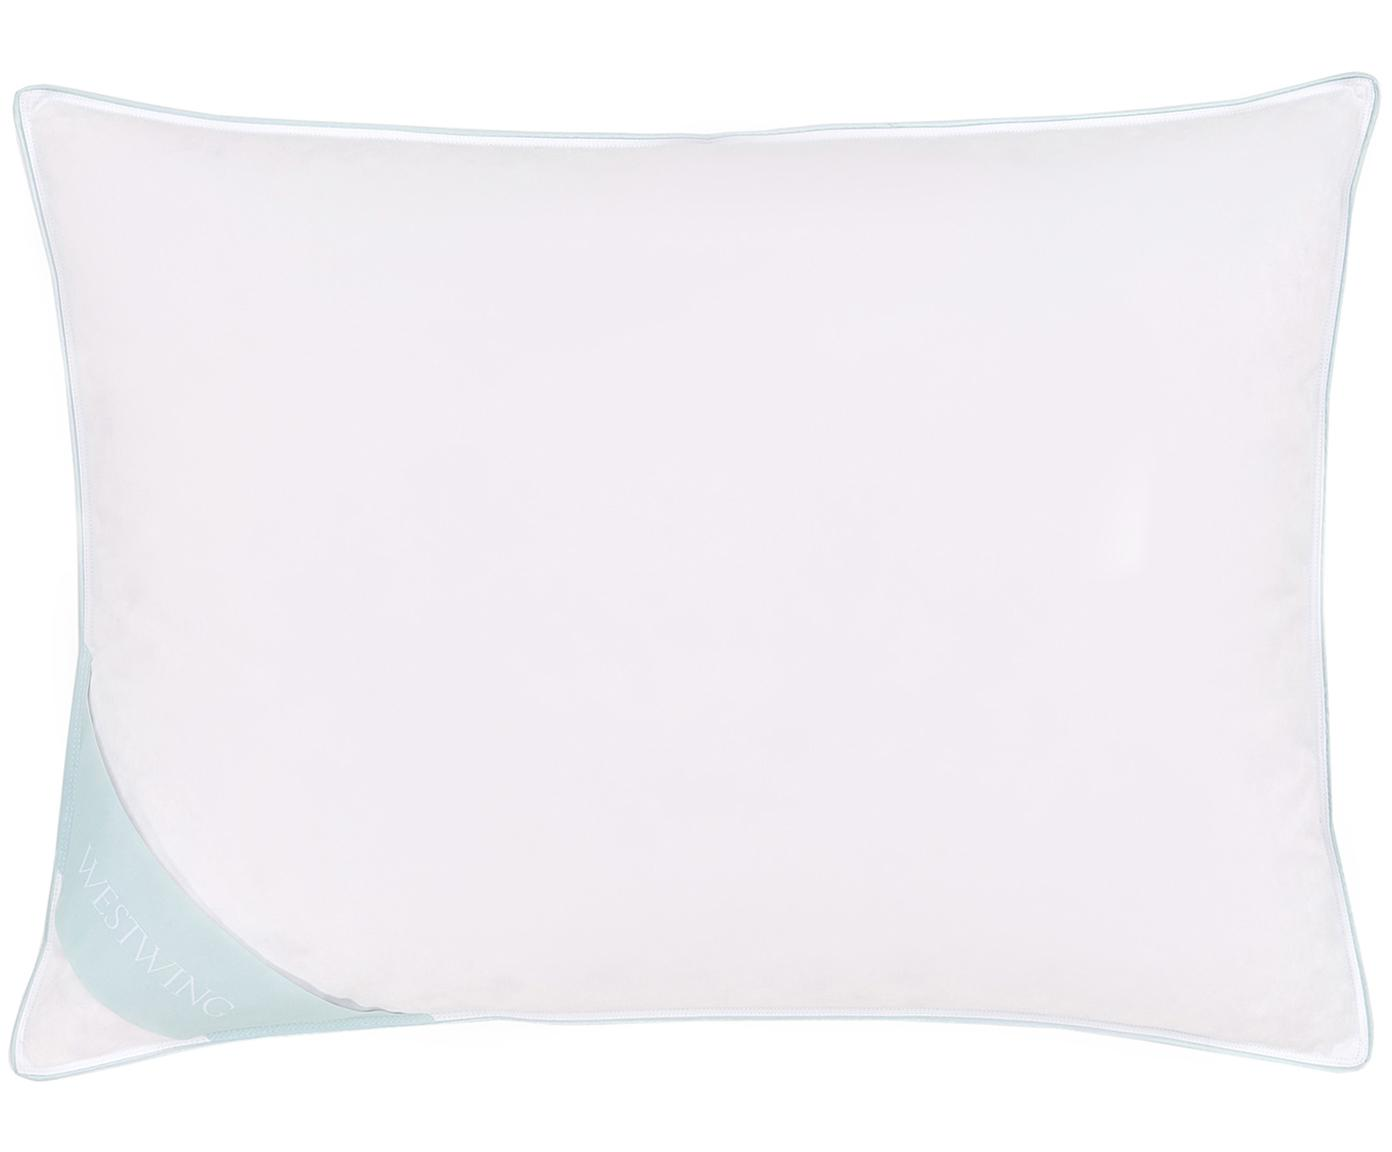 Almohada de plumas Comfort, dura, Funda: 100%algodón, sarga de Ma, Blanco con ribete turquesa satinado, An 50 cm x L 70 cm